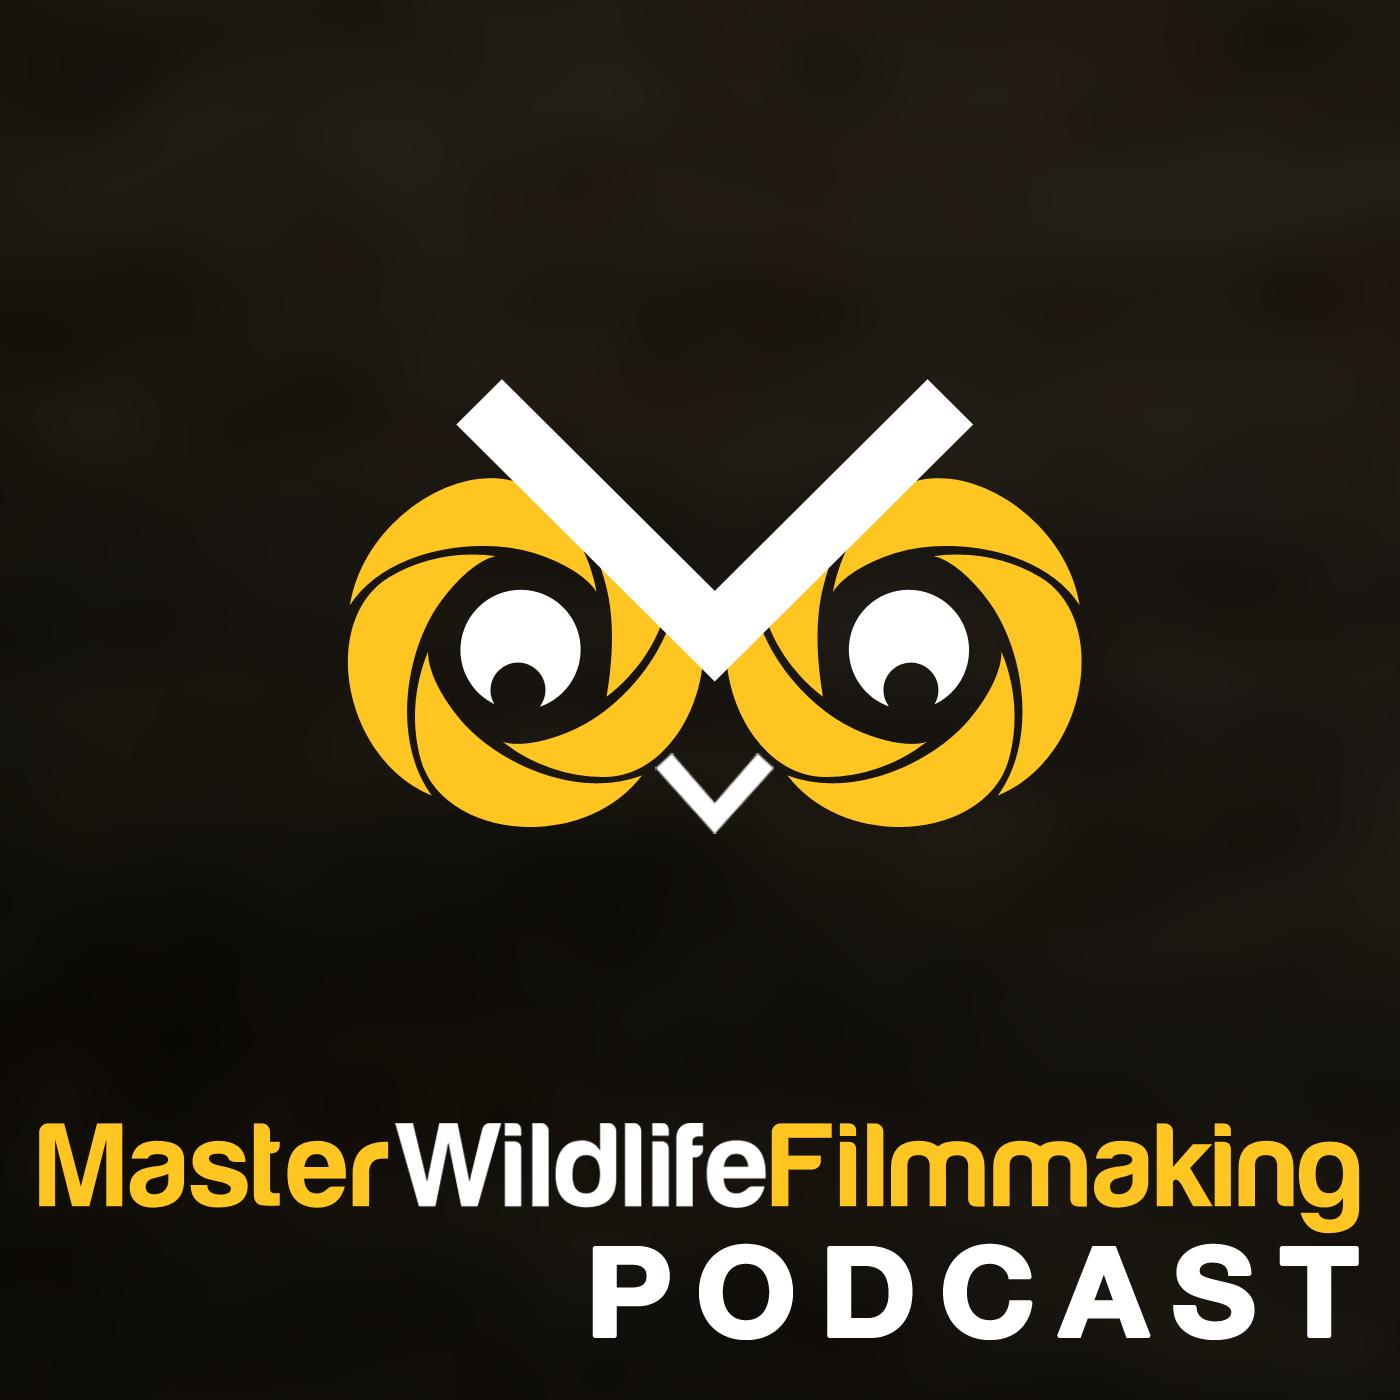 Master Wildlife Filmmaking podcast show art